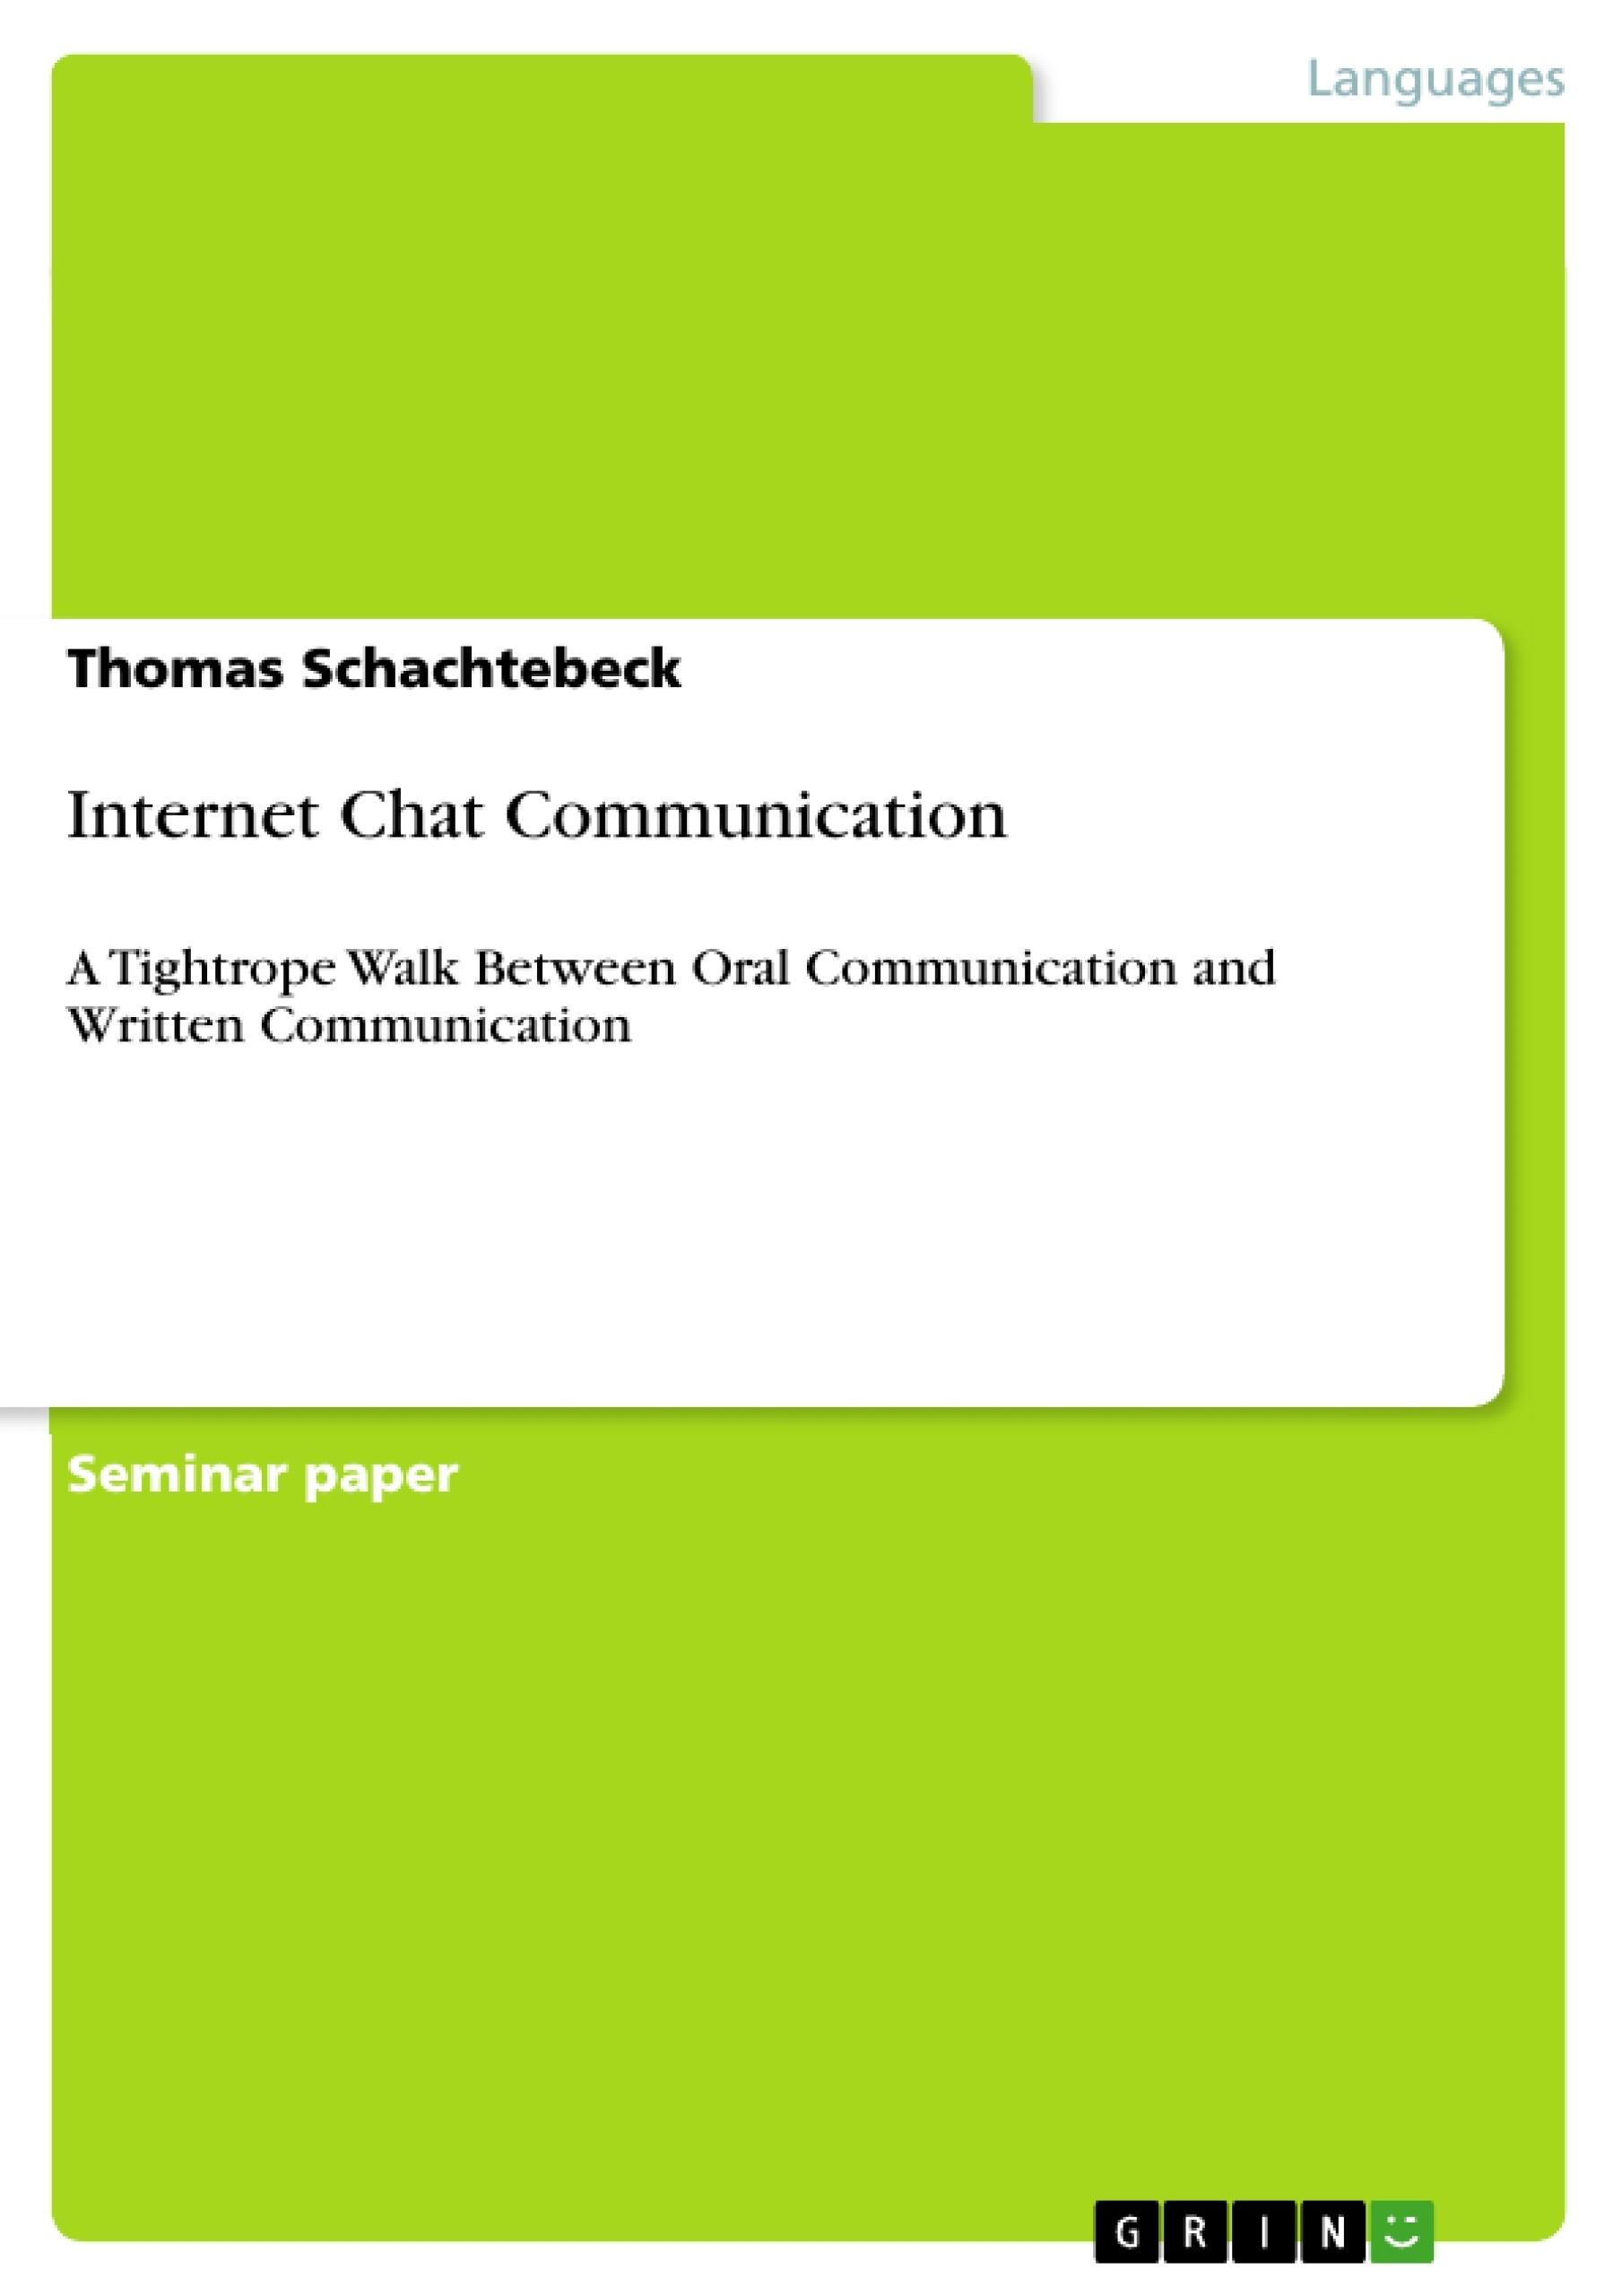 Title: Internet Chat Communication